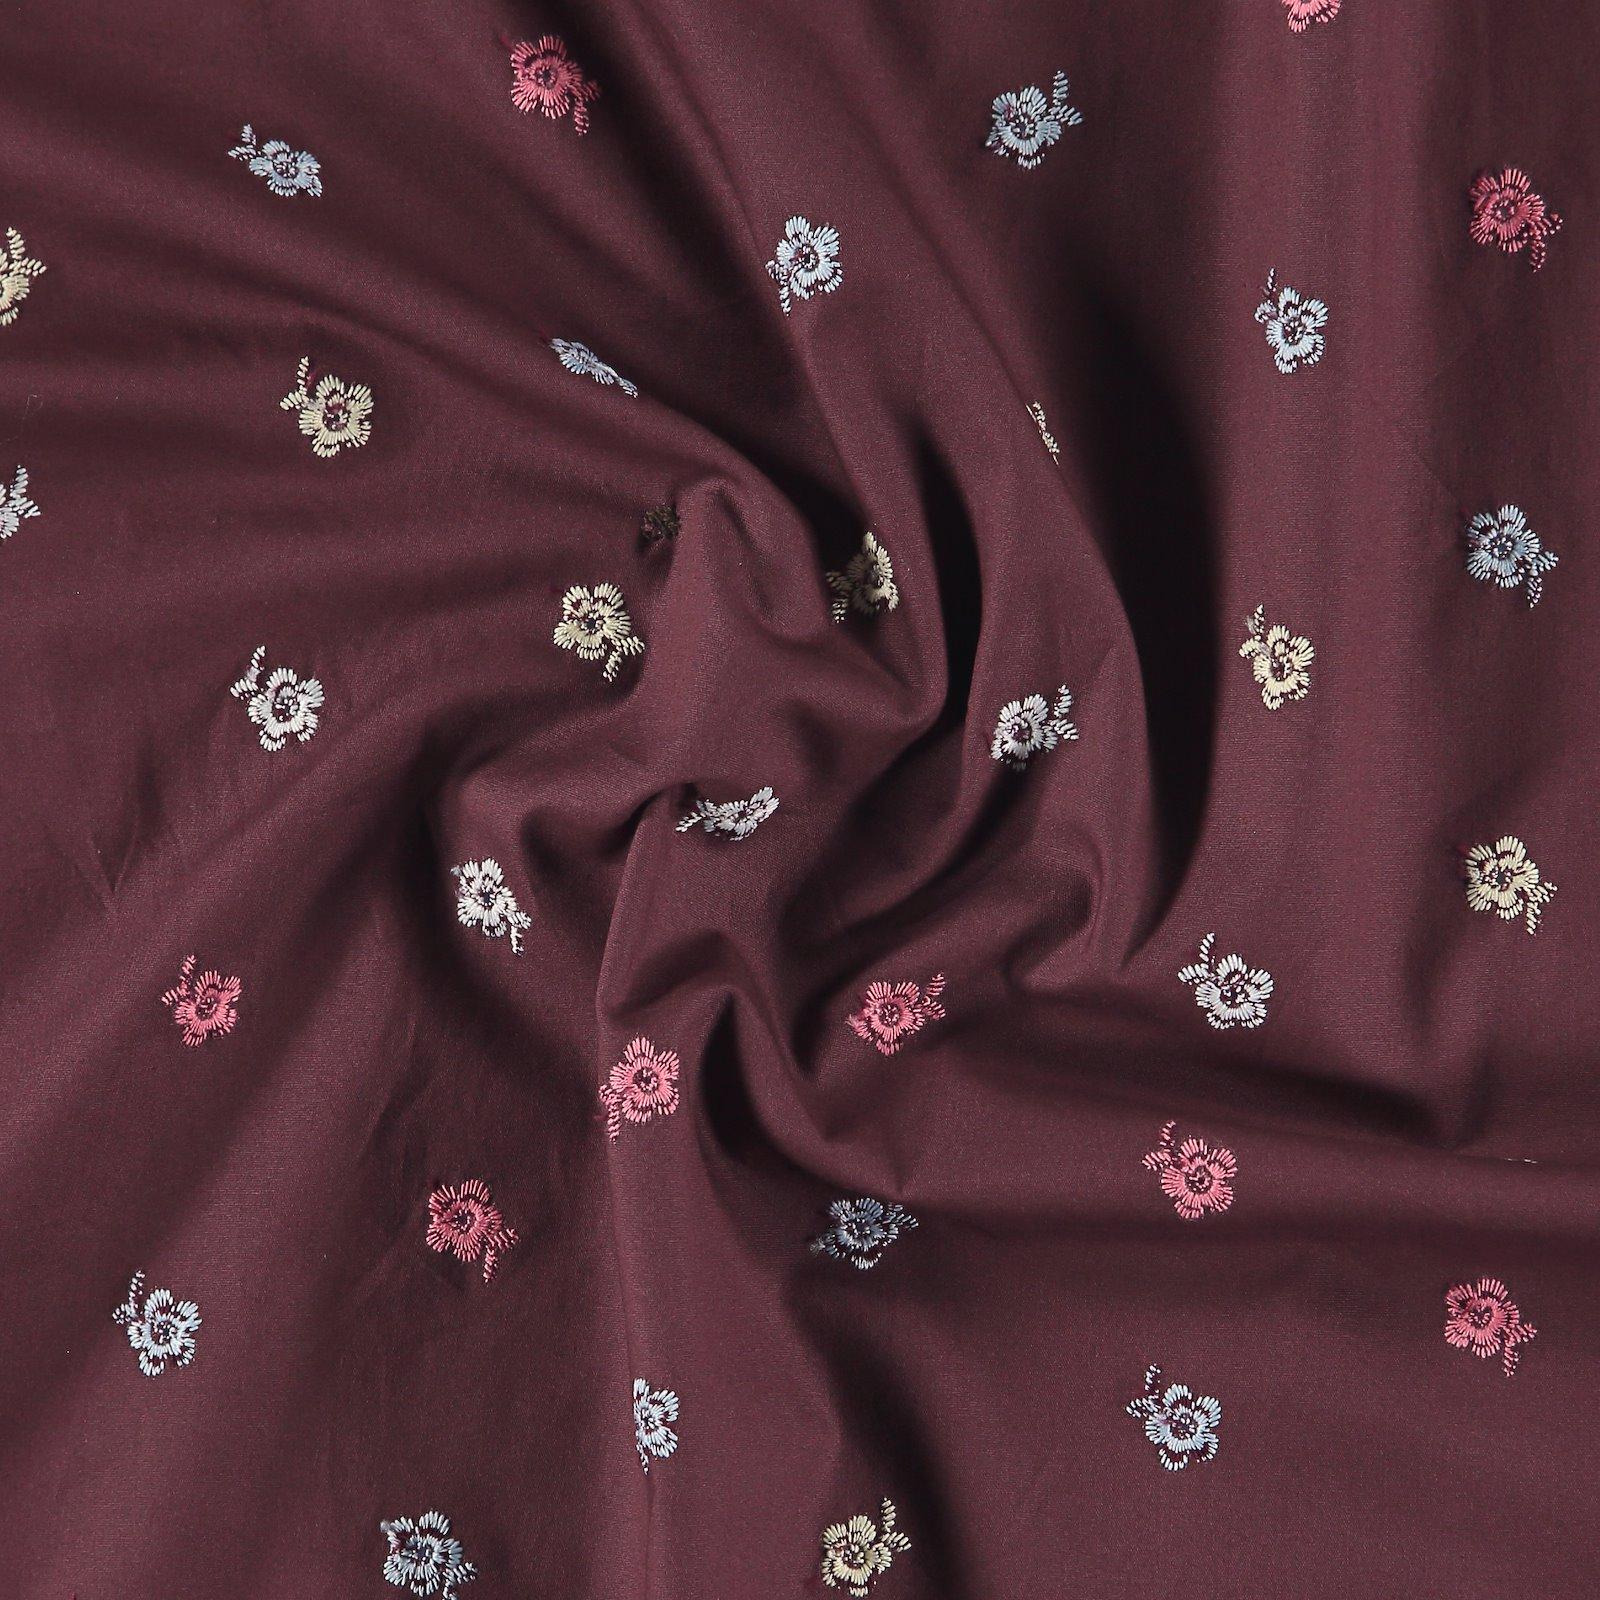 Broderie anglaise dark plum w flowers 550108_pack